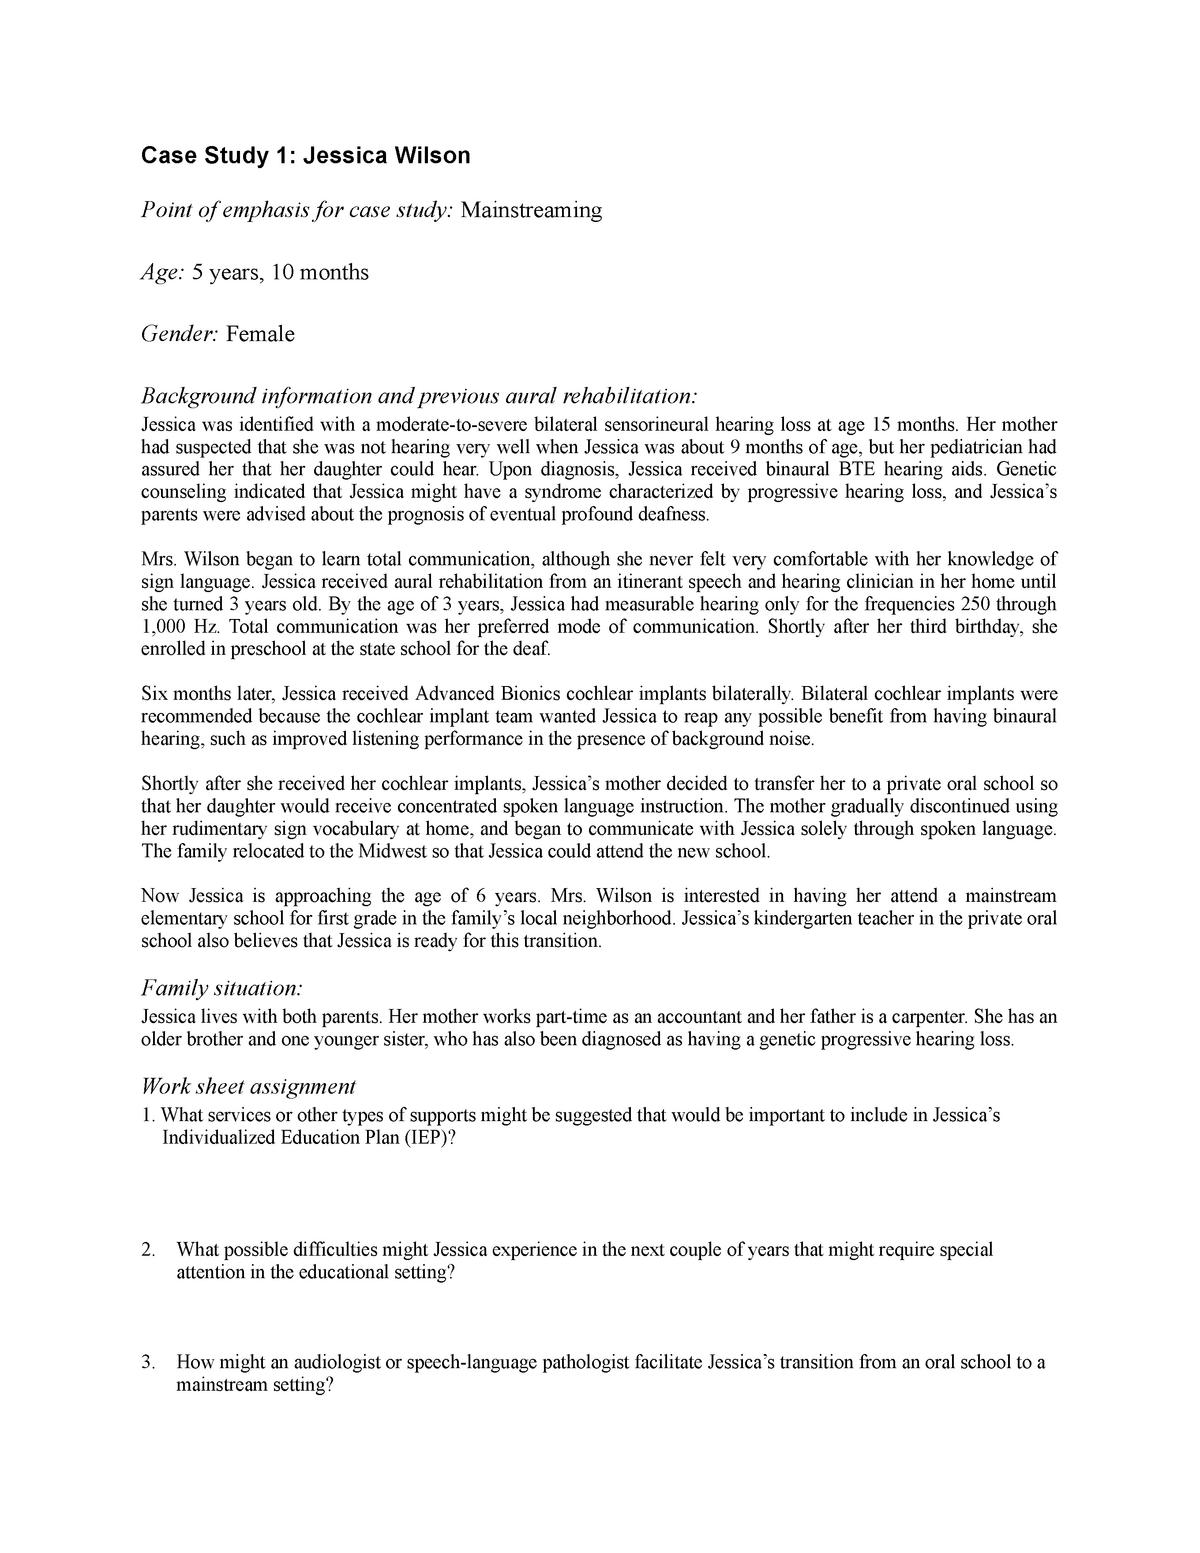 Case Study One for Student - child - SLP 404: Aural